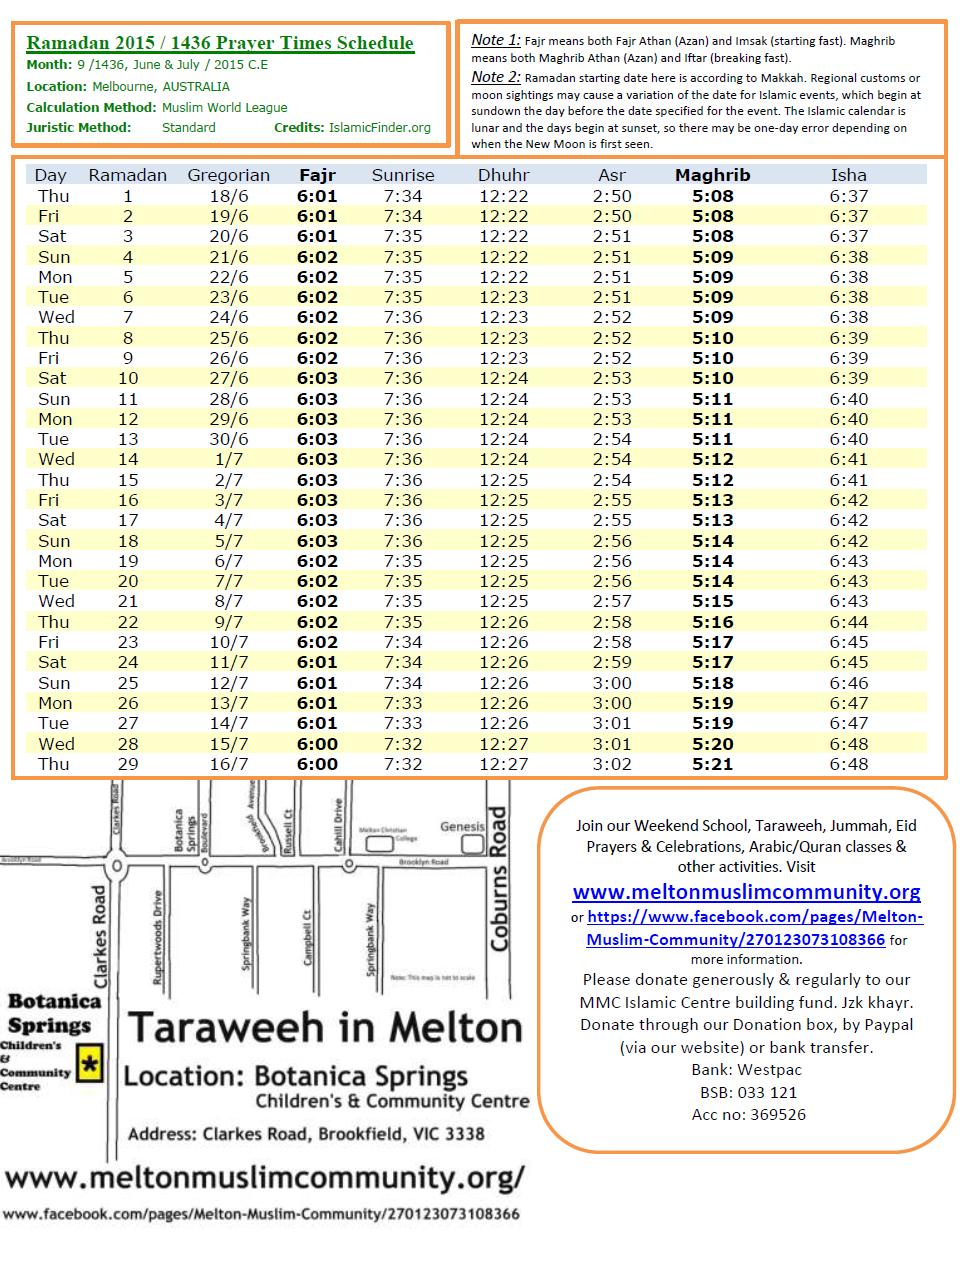 Ramadan Calendar 2015 – Melbourne | Victorian Muslimah Australia in Ramadan Time Table 2015